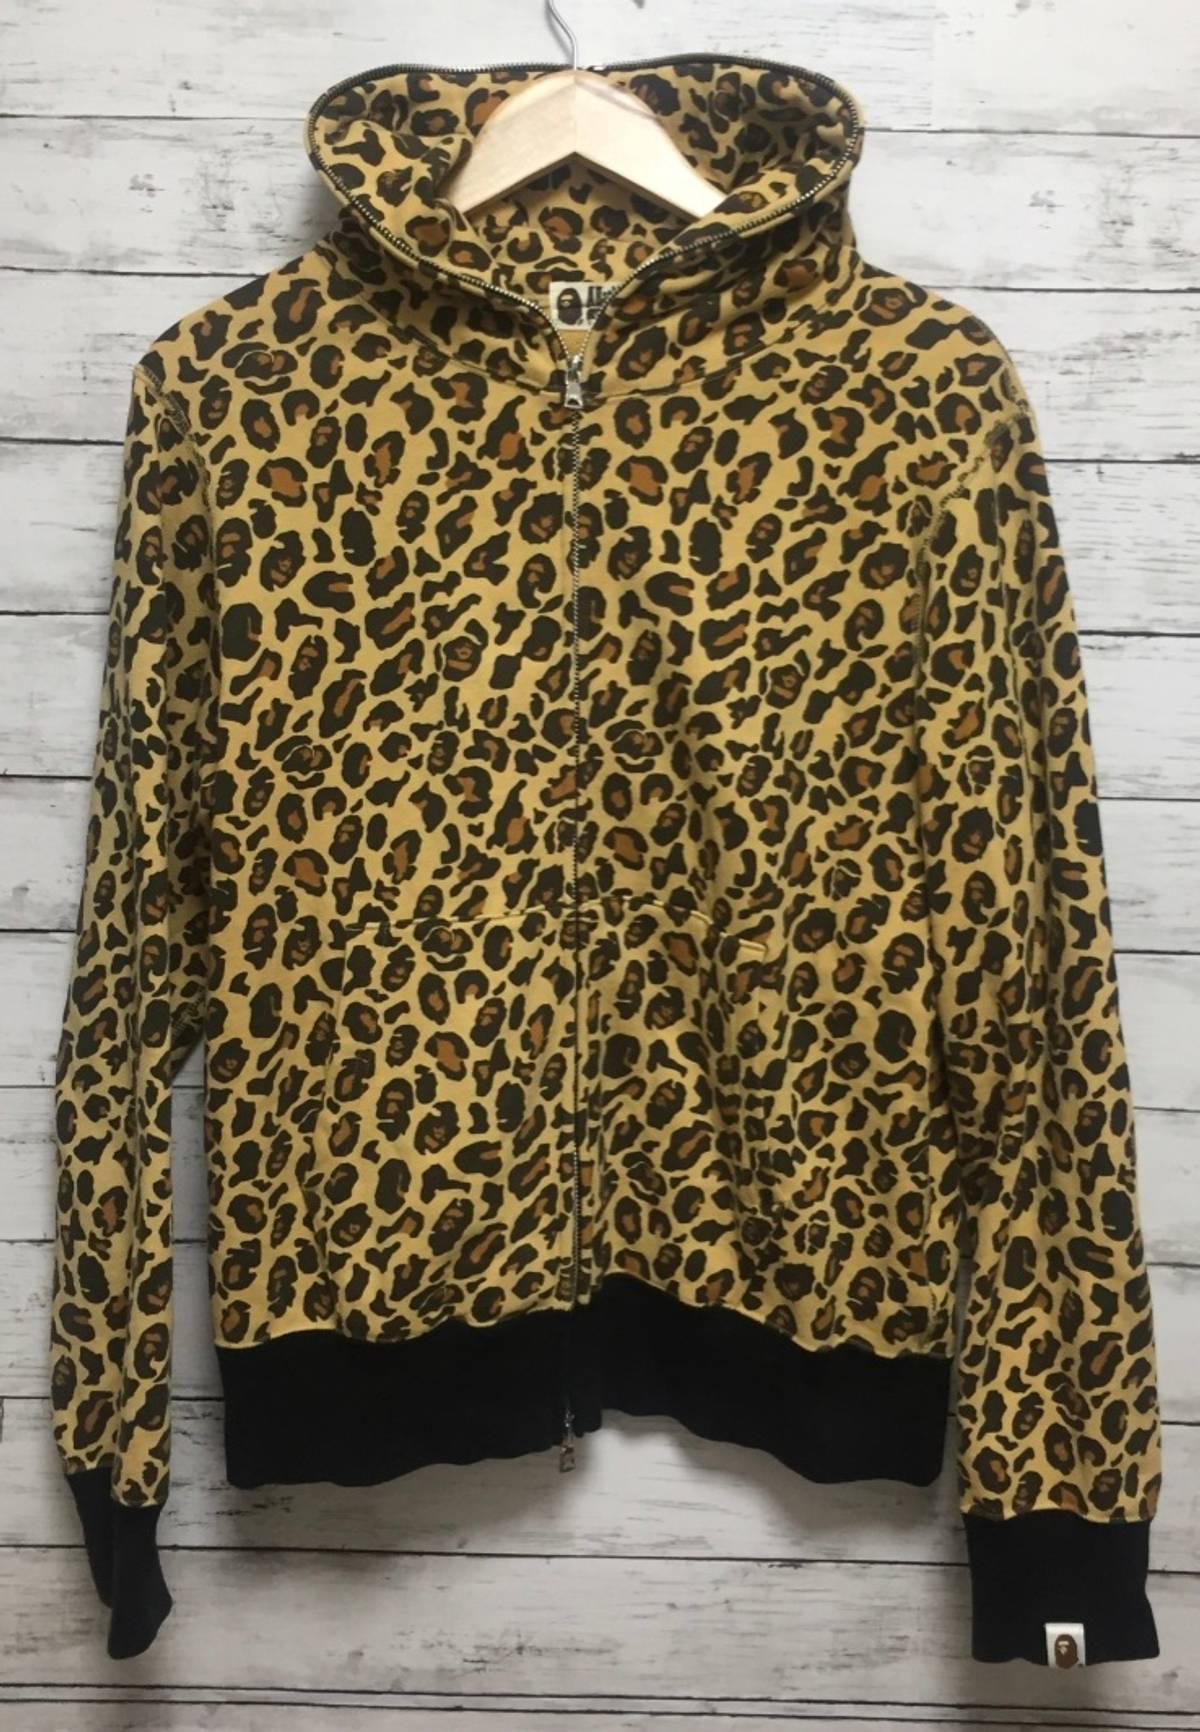 5478a034dab12 Bape Bape Leopard Camo Print Full Zip Hoodie | Grailed